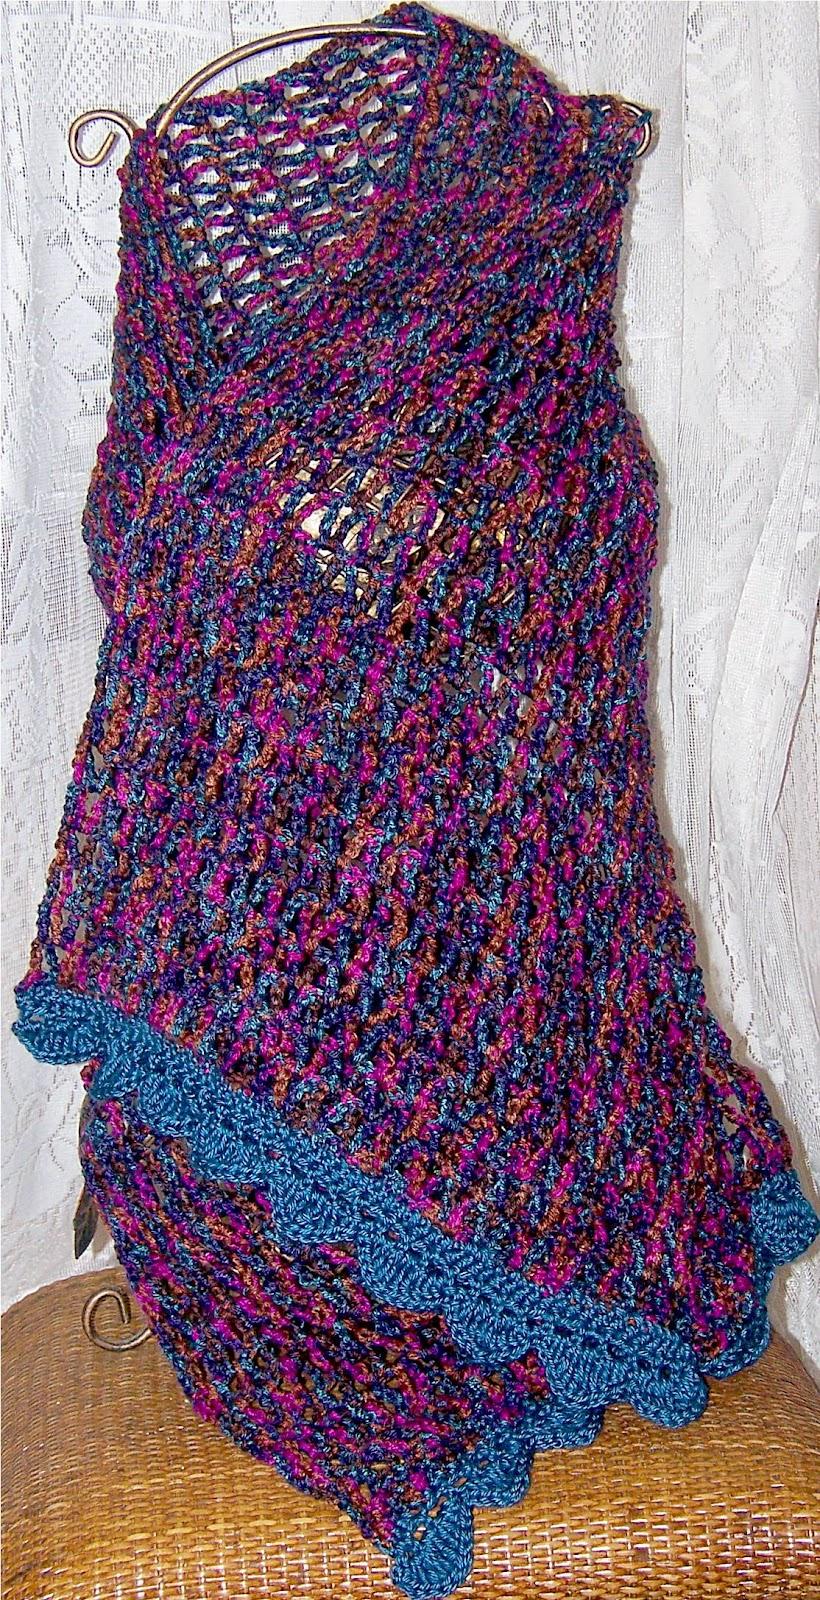 Crochet KrAzY!!